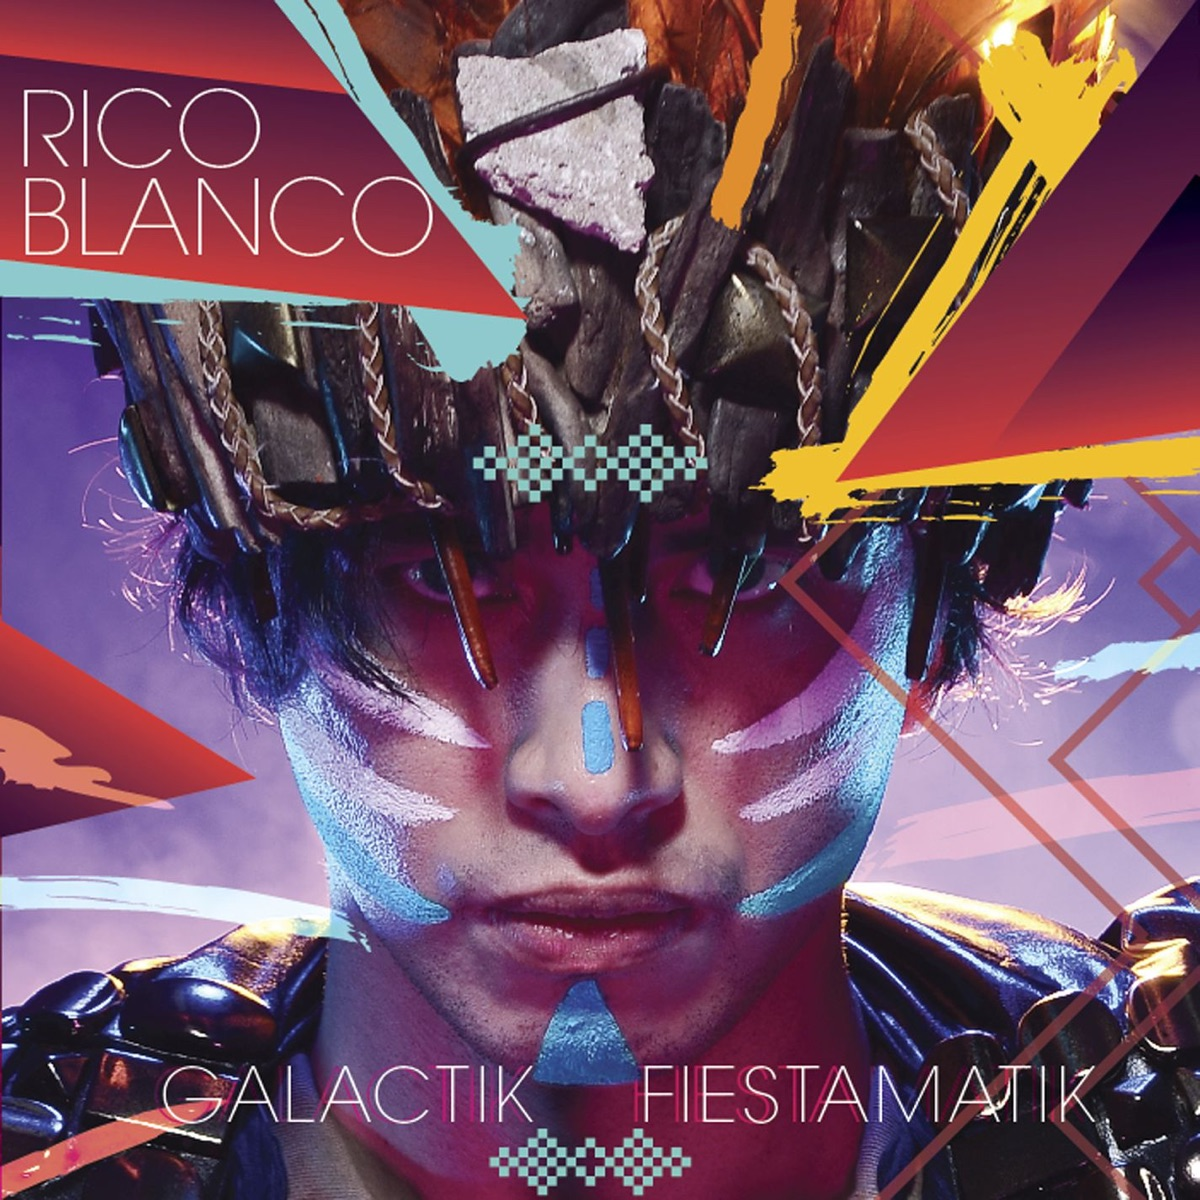 Rico blanco dating gawi album art